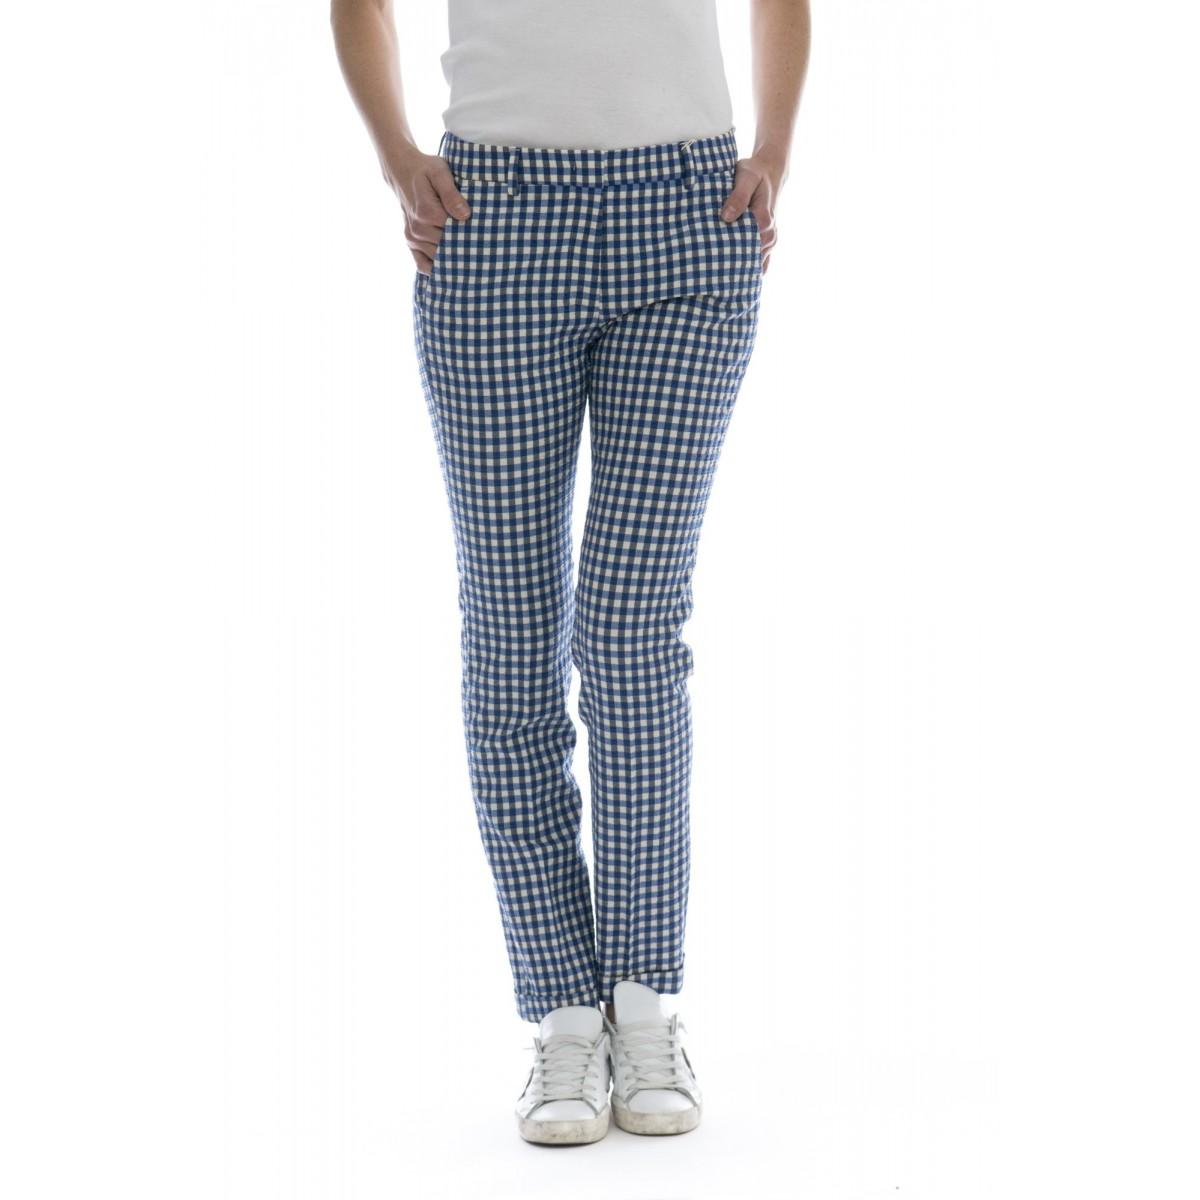 Pantalone donna - 172568 d6229 layre seersucker